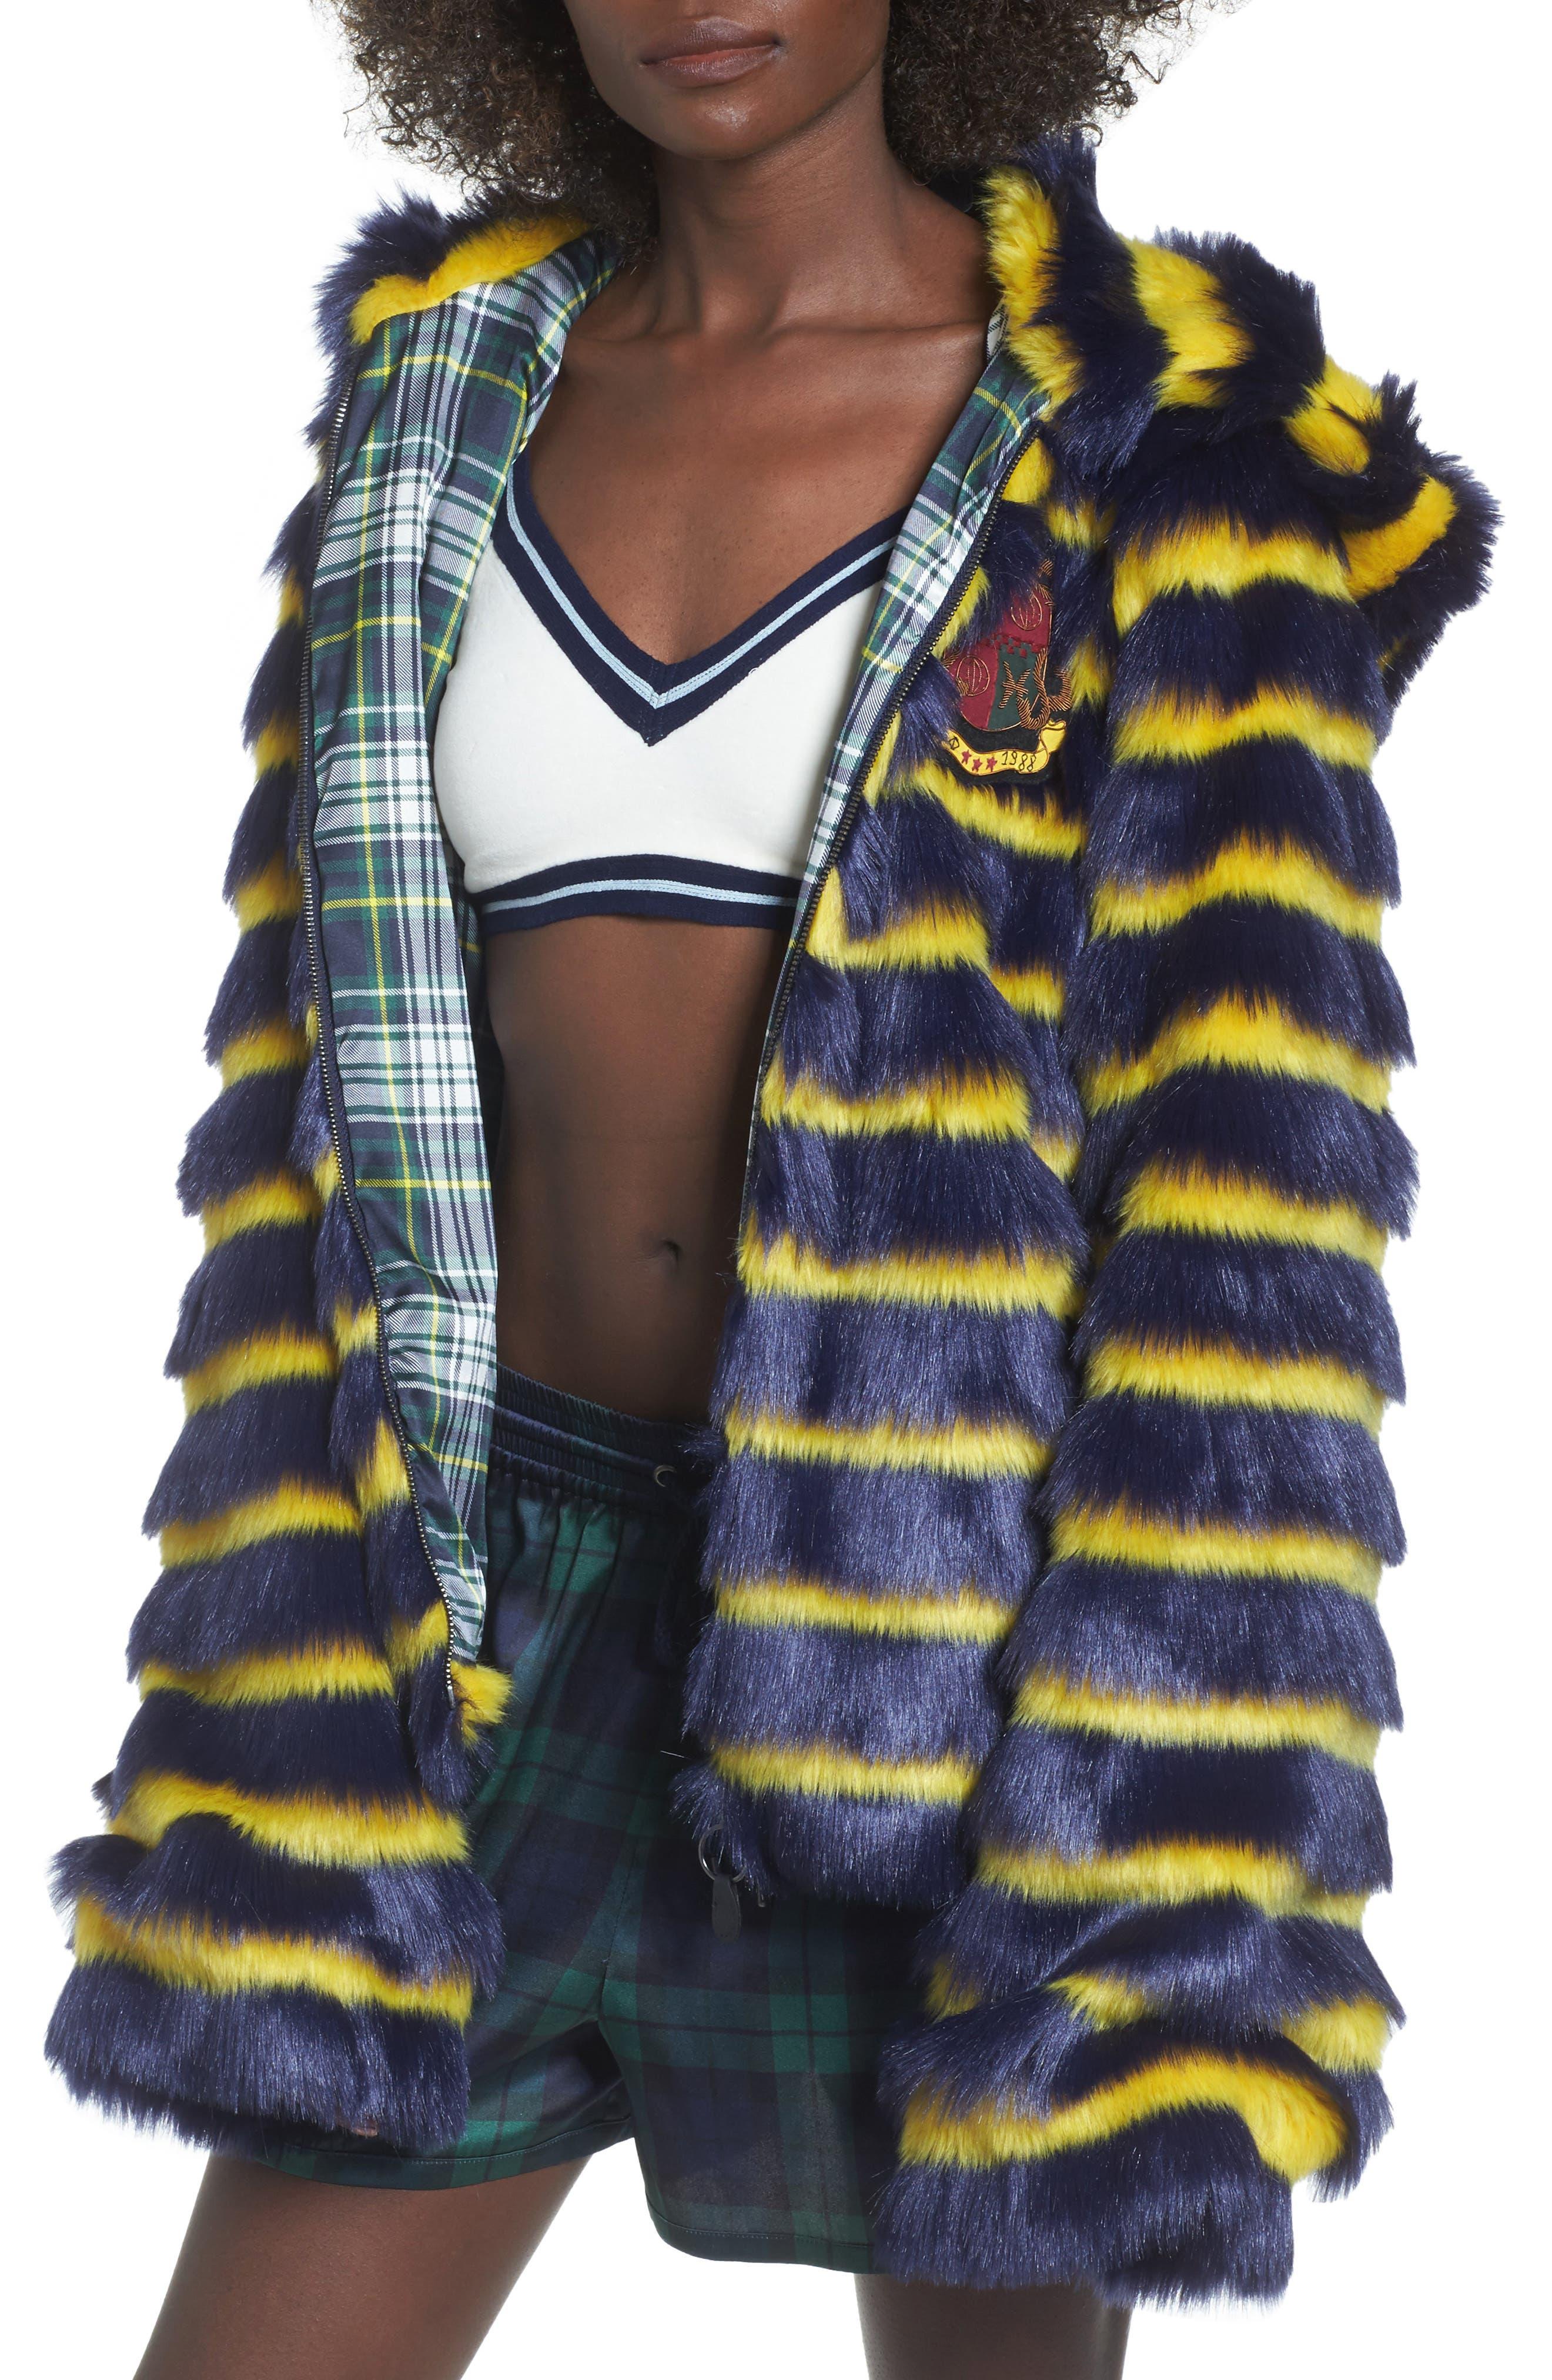 Alternate Image 1 Selected - FENTY PUMA by Rihanna Faux Shearling Hooded Jacket